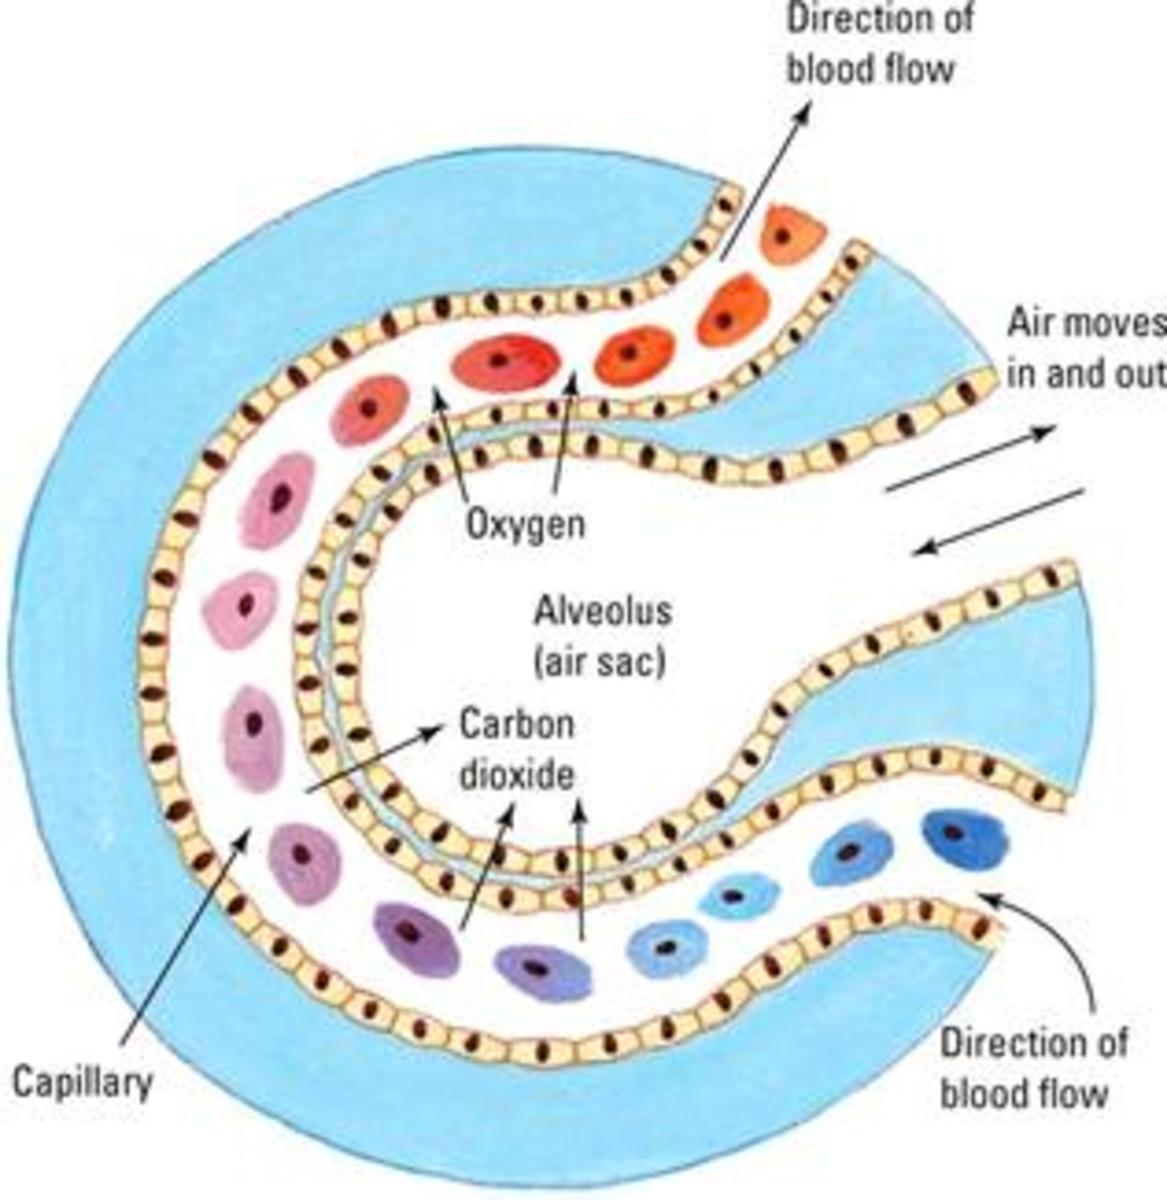 Illustration of gaseous exchange in the alveoli